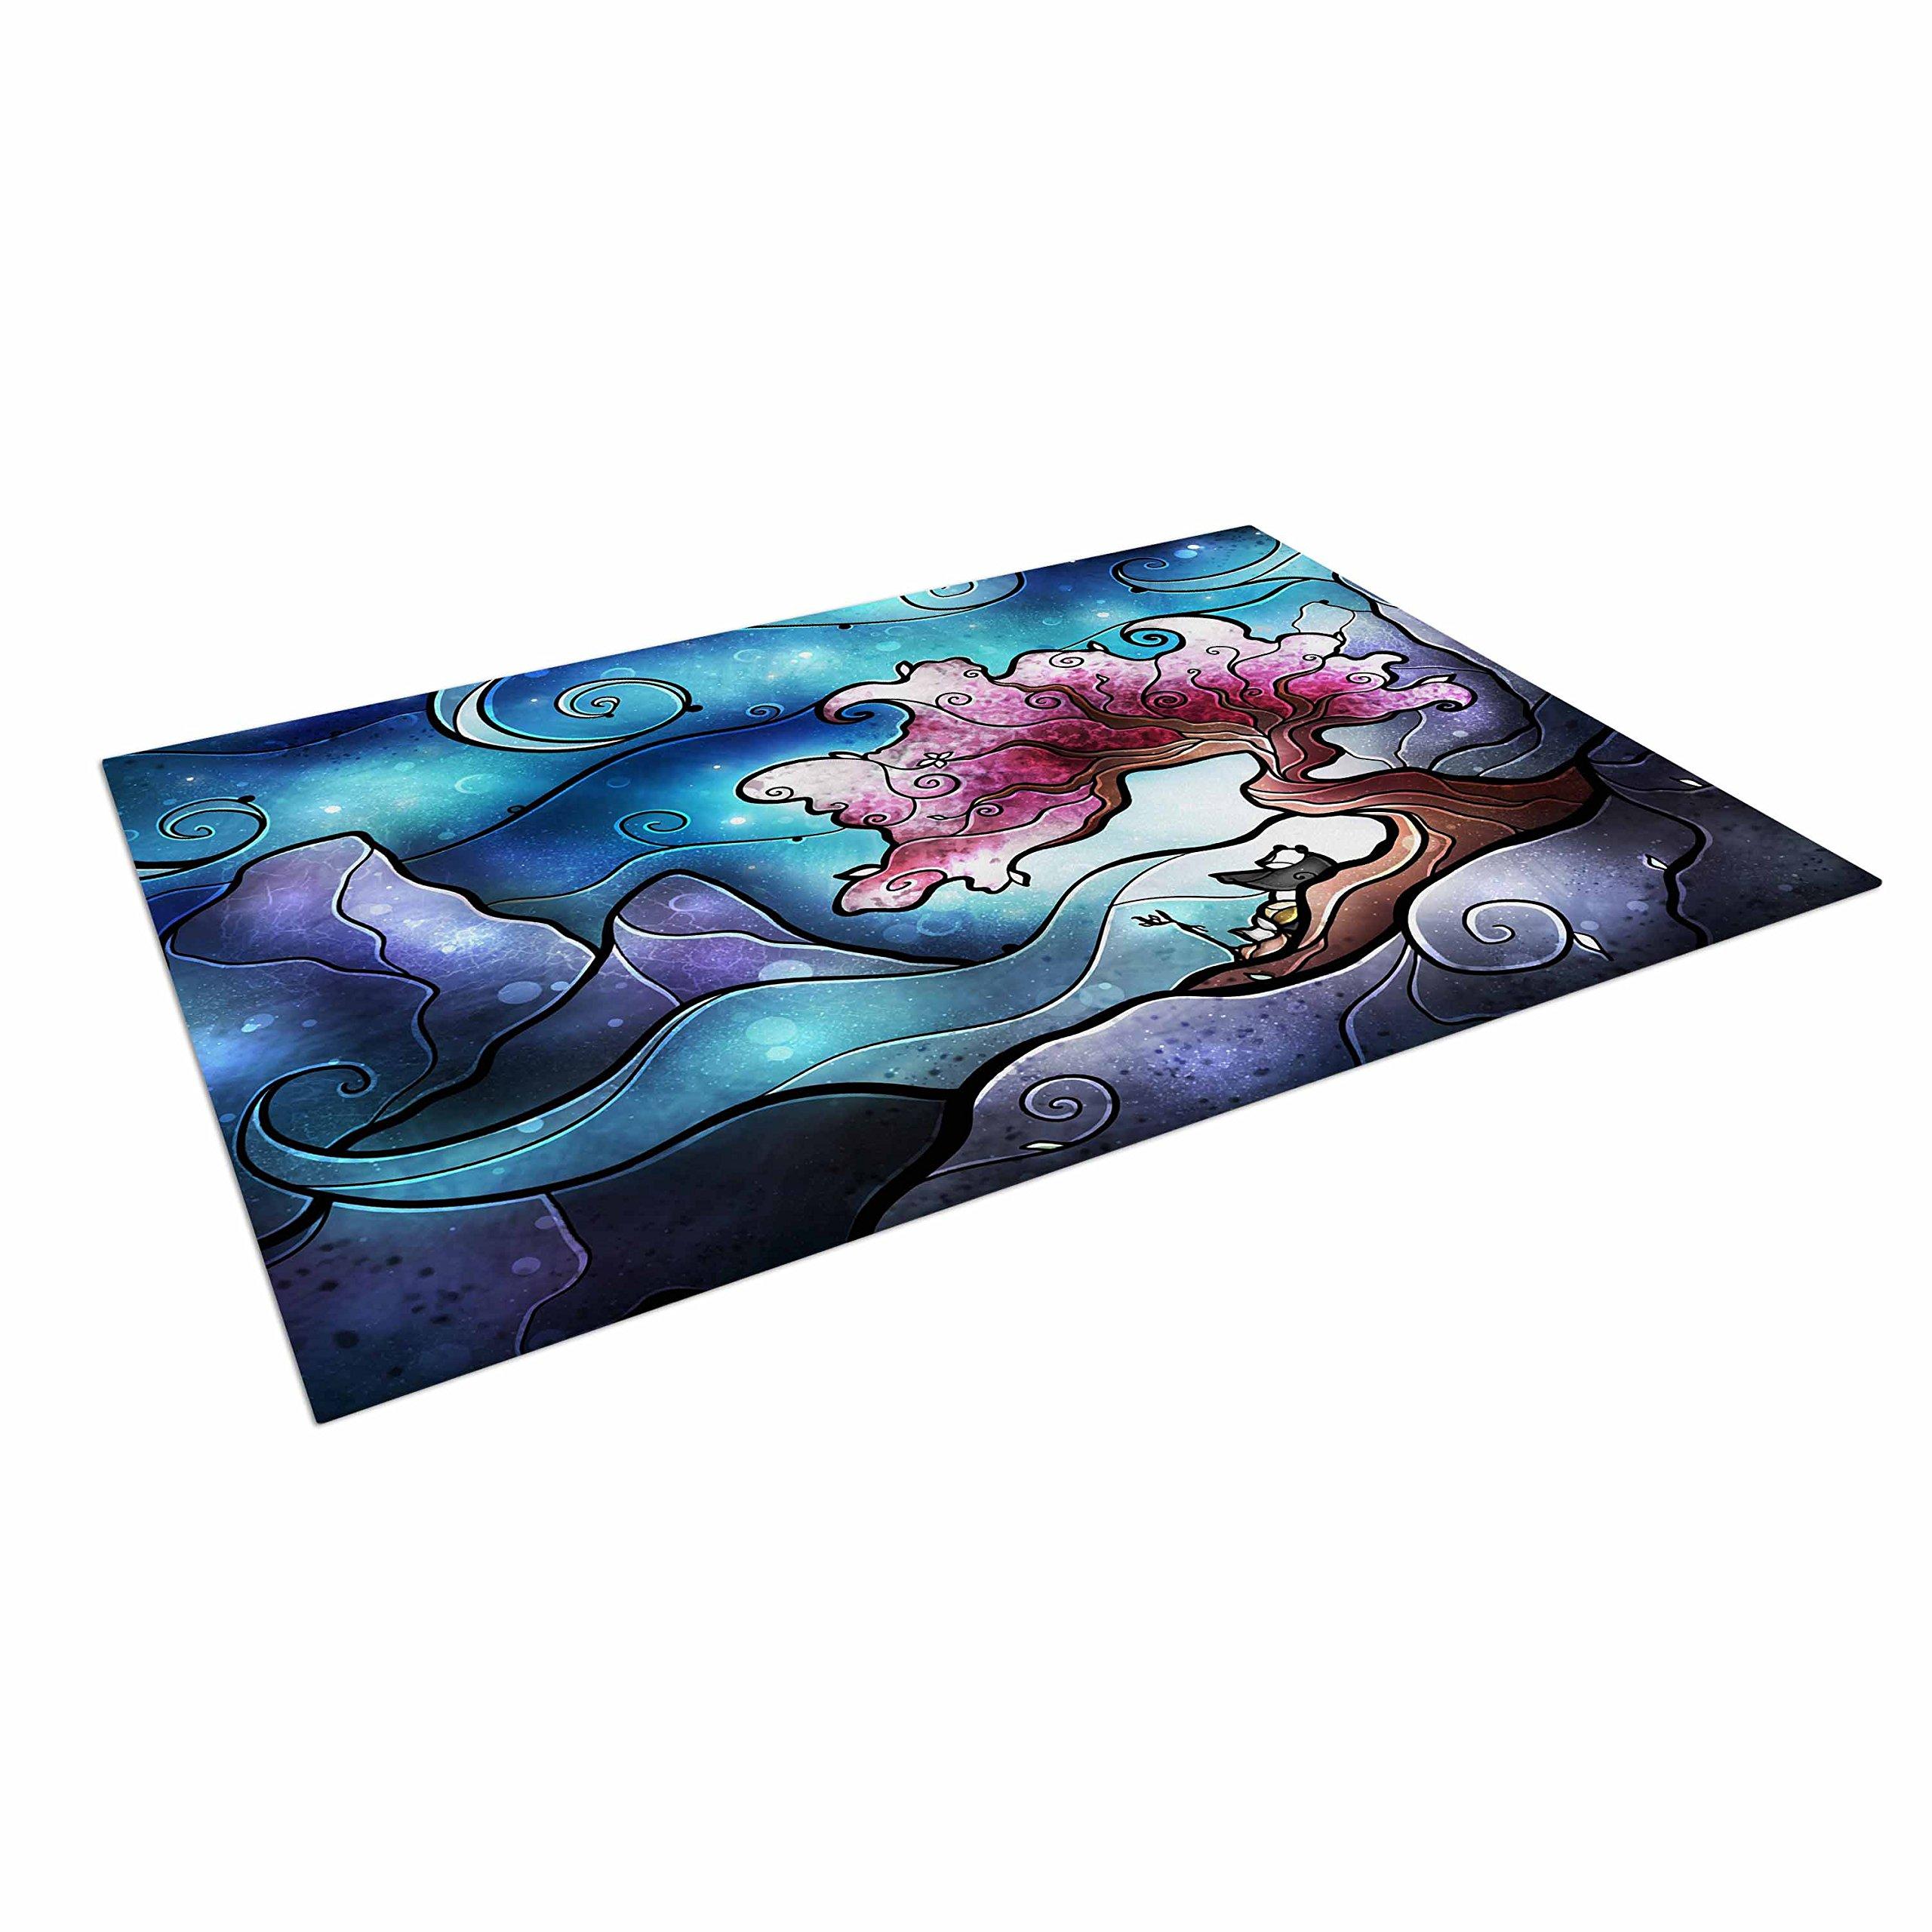 KESS InHouse Mandie Manzano ''Sea Dance'' Blue Orange Outdoor Floor Mat, 4' x 5'